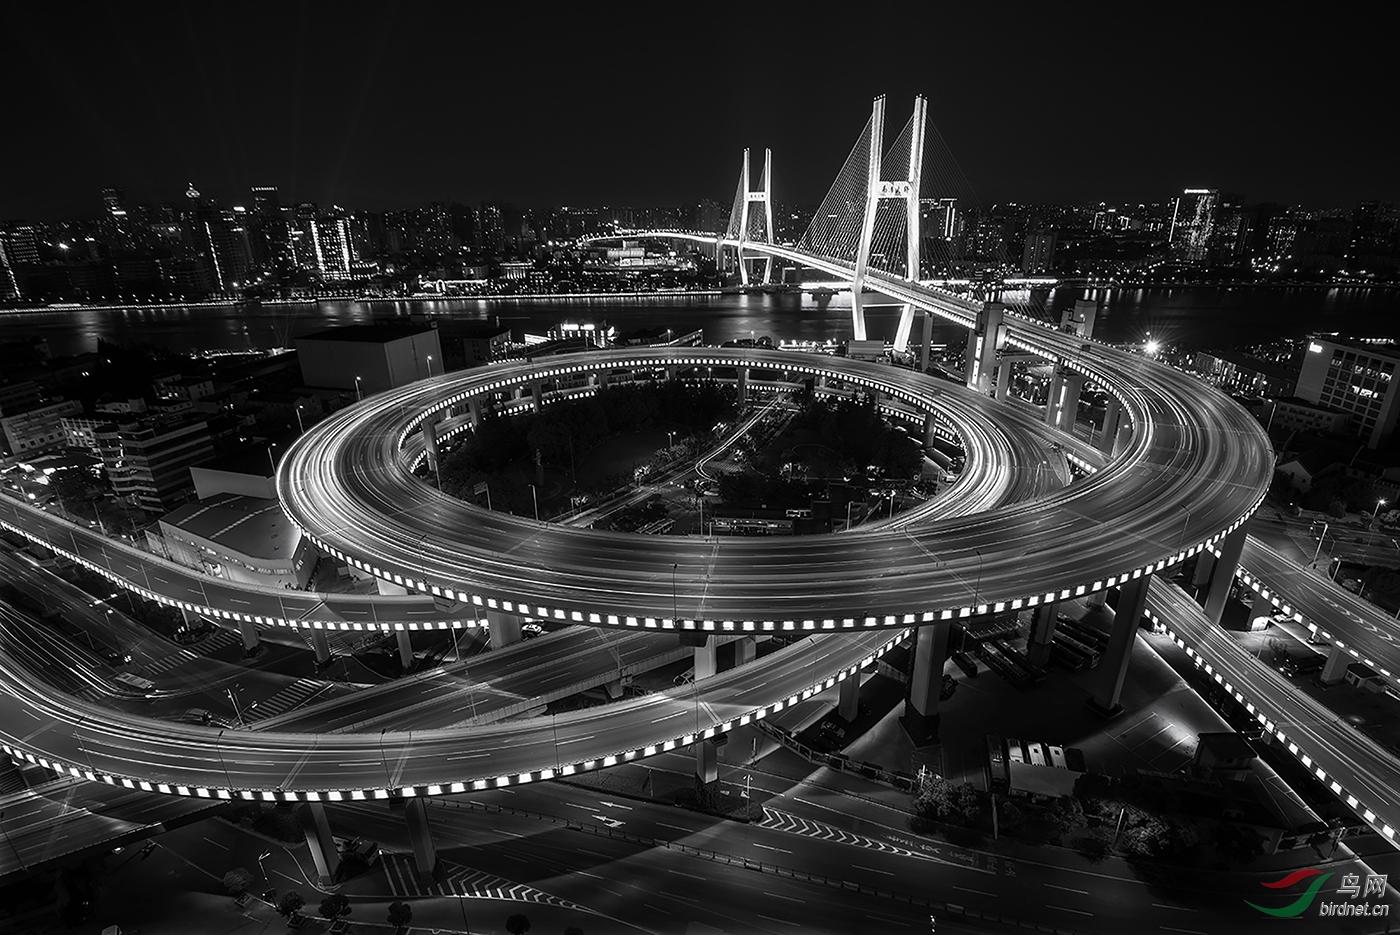 DO5890 郭顺利 B4 城市夜色The night in the city.jpg